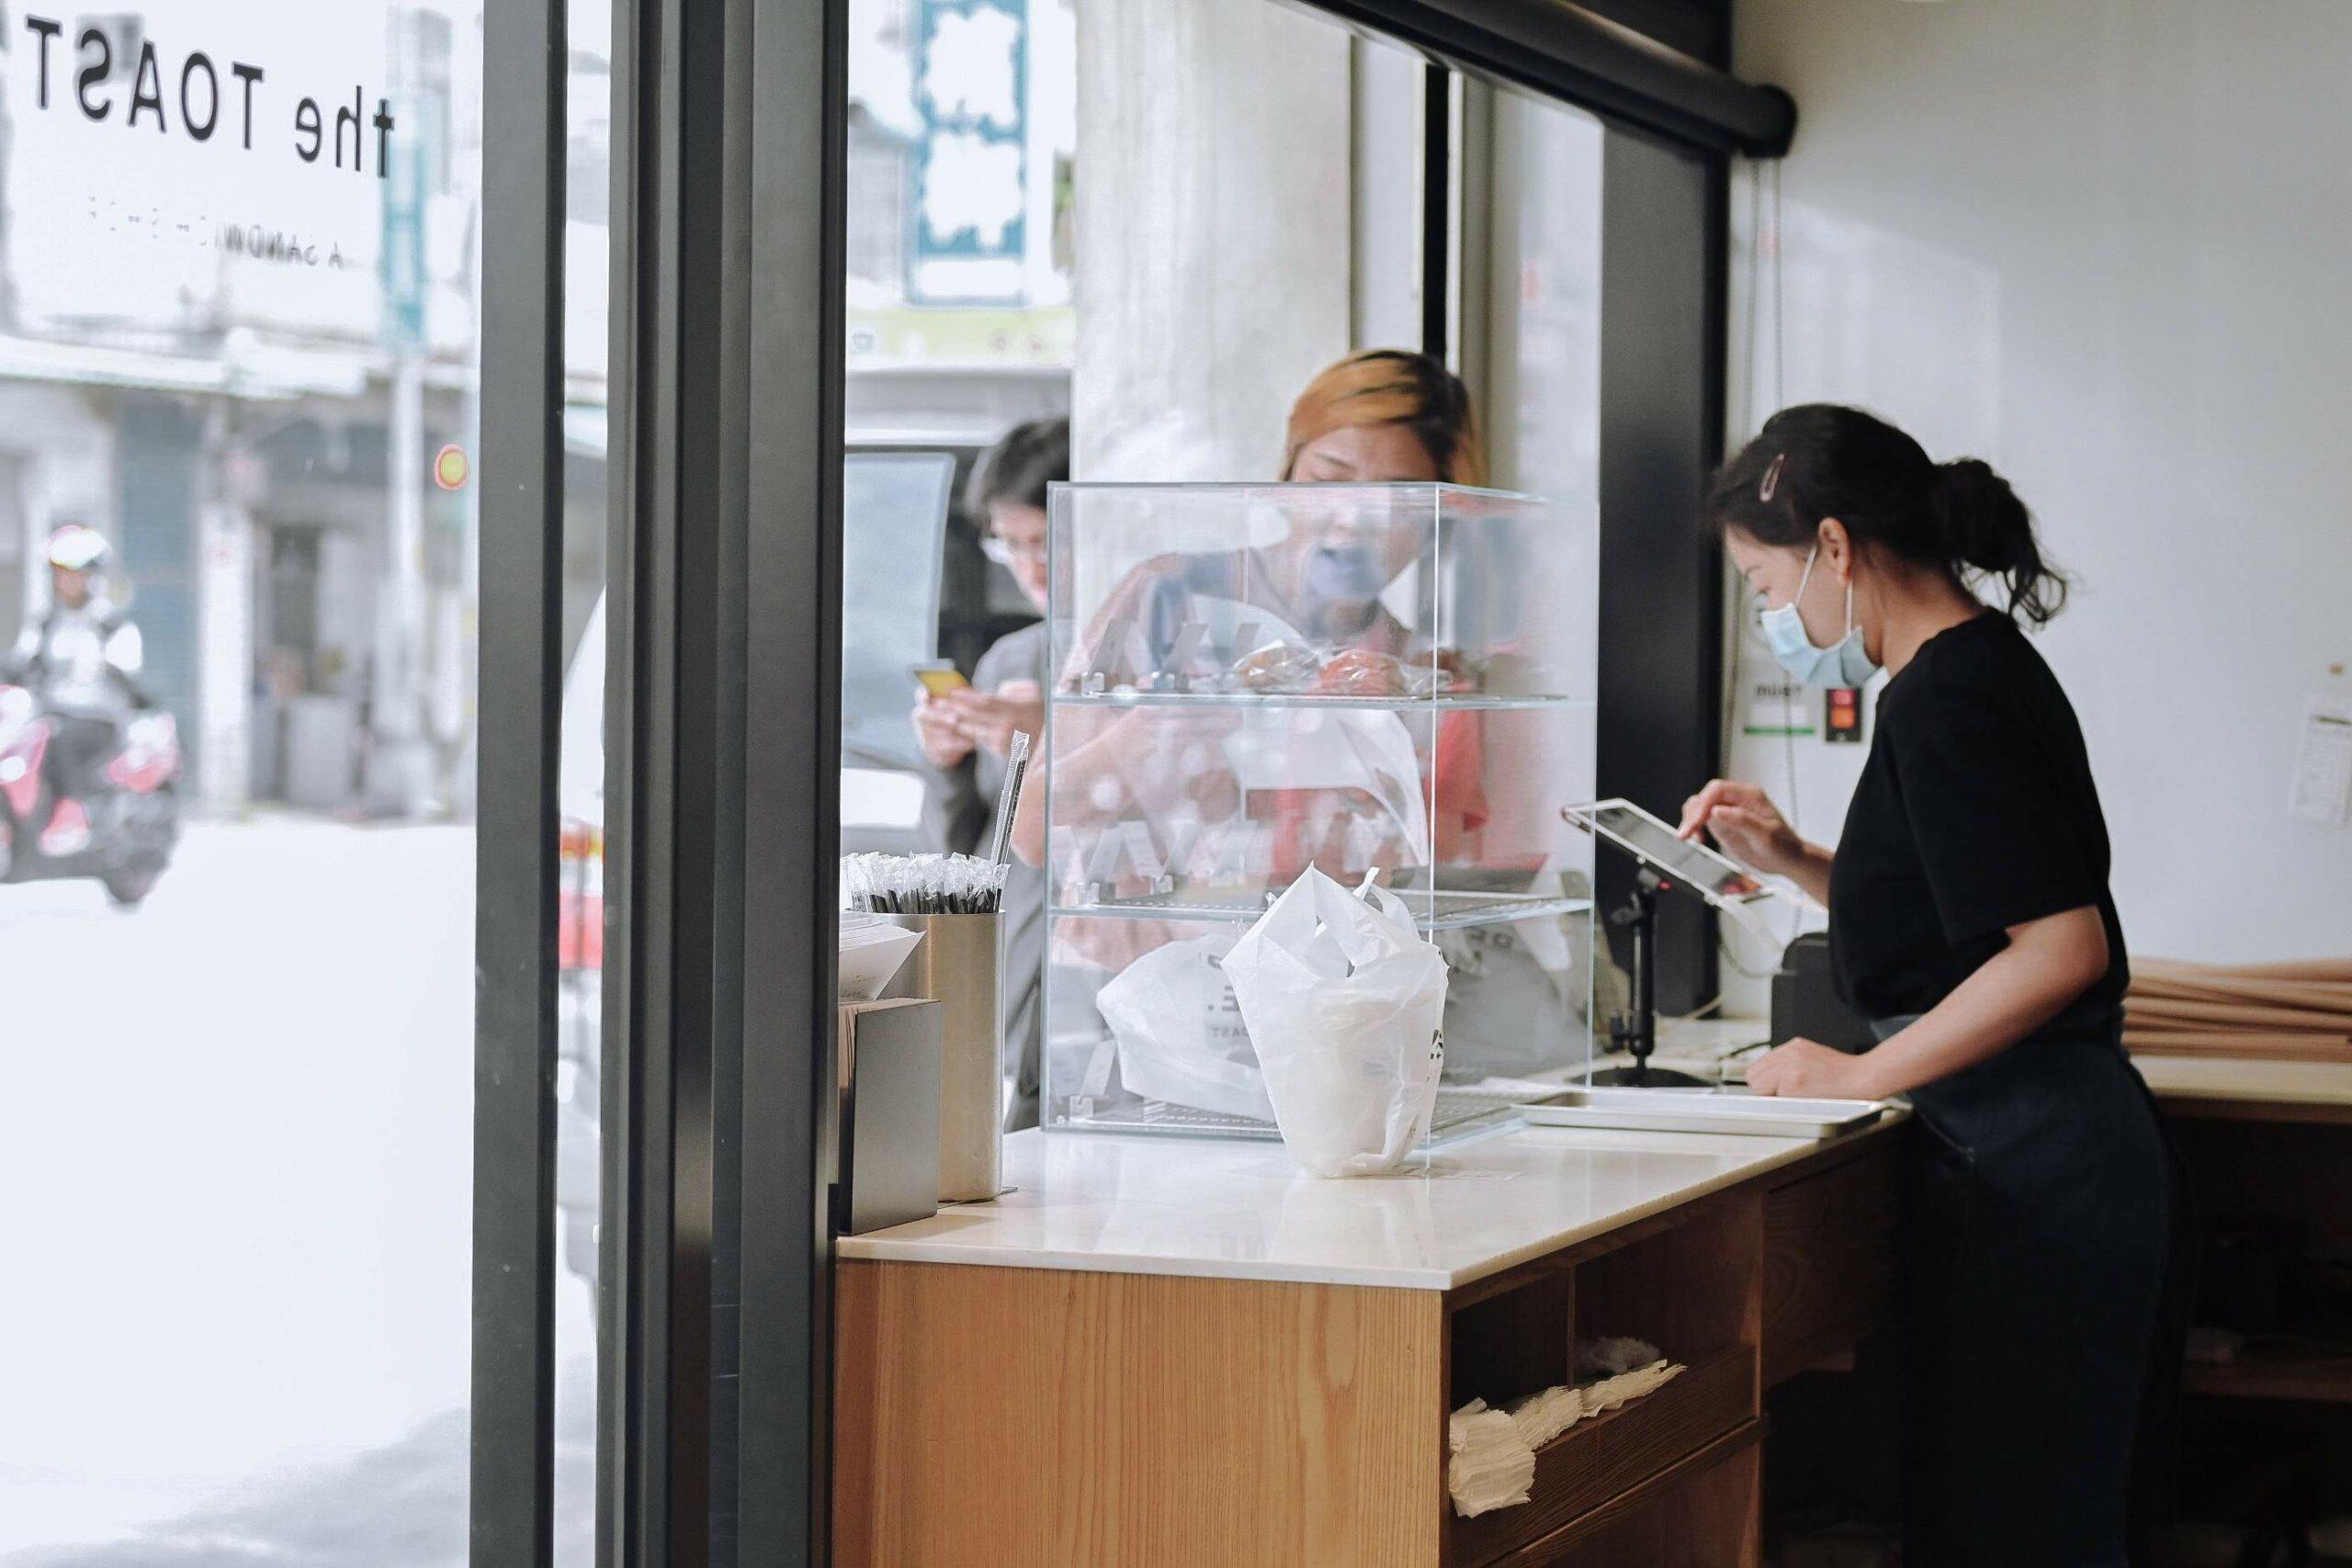 THE TOAST:三重IG打卡人氣爆紅早餐,高配版早餐店也是咖啡廳/中興北街早餐/先嗇宮美食/菜單 @女子的休假計劃